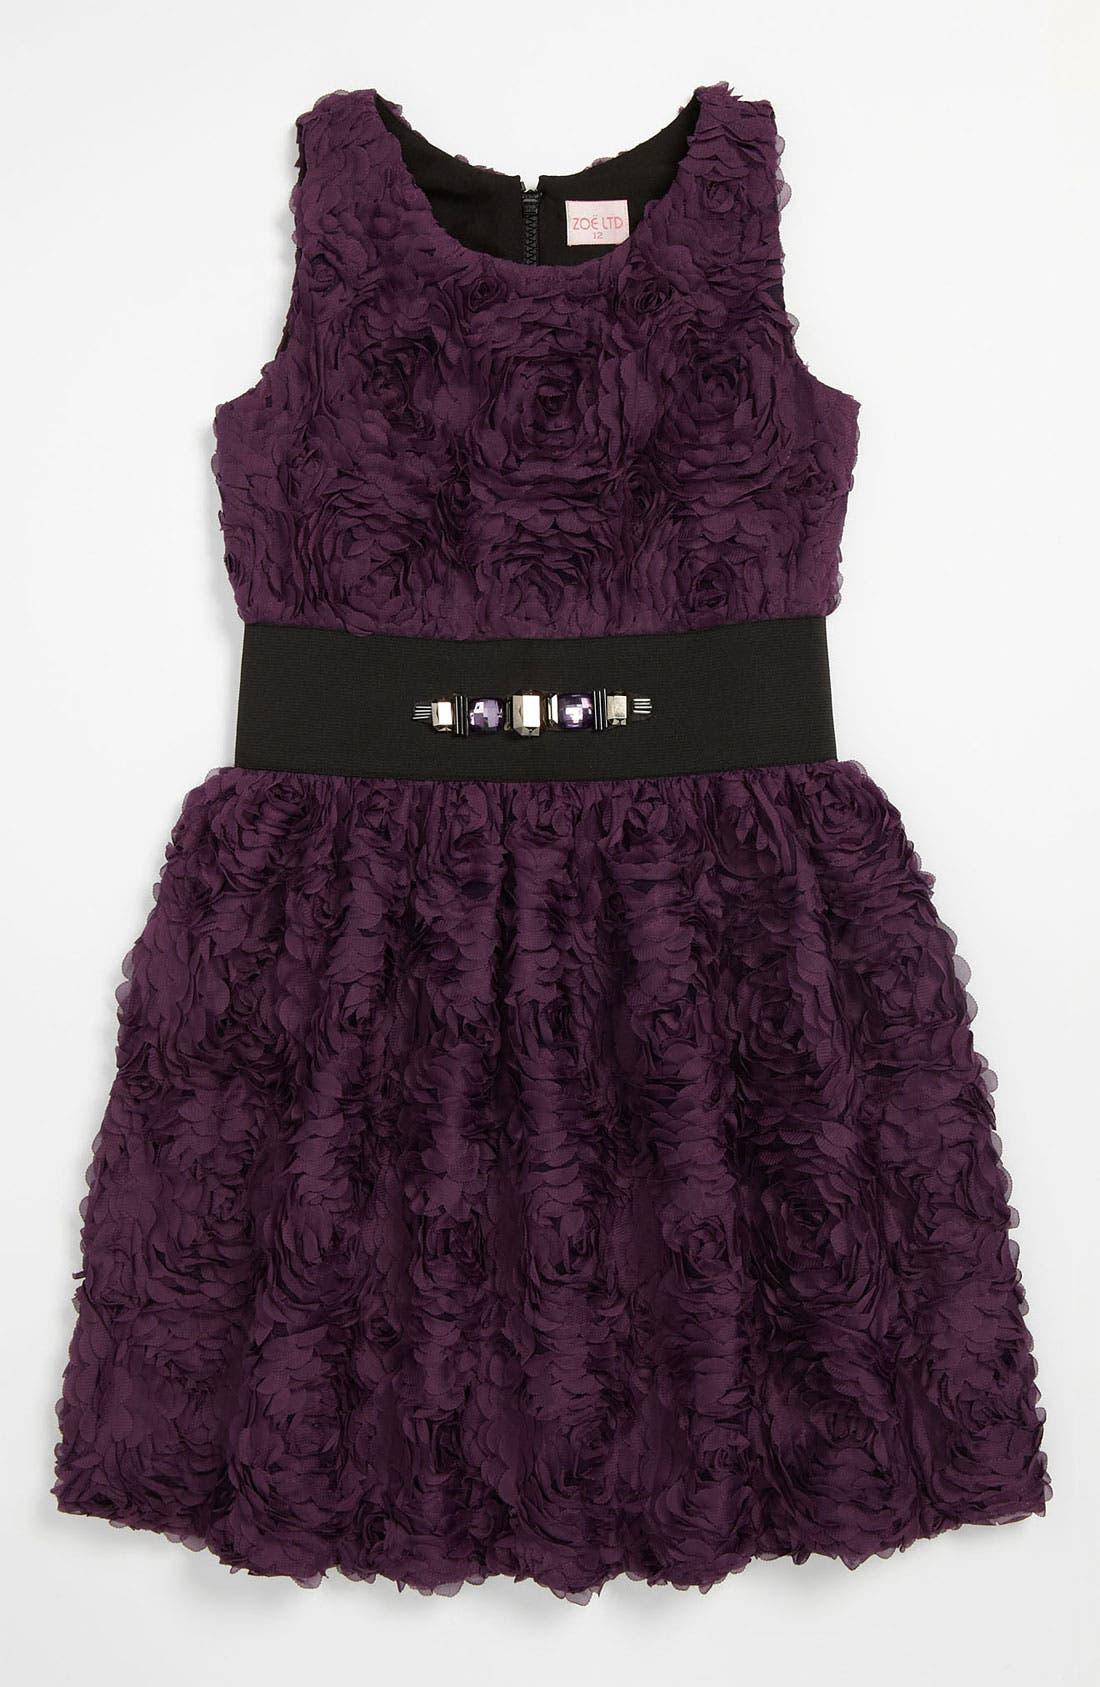 Main Image - Zoe Ltd 'Roses' Dress (Big Girls)